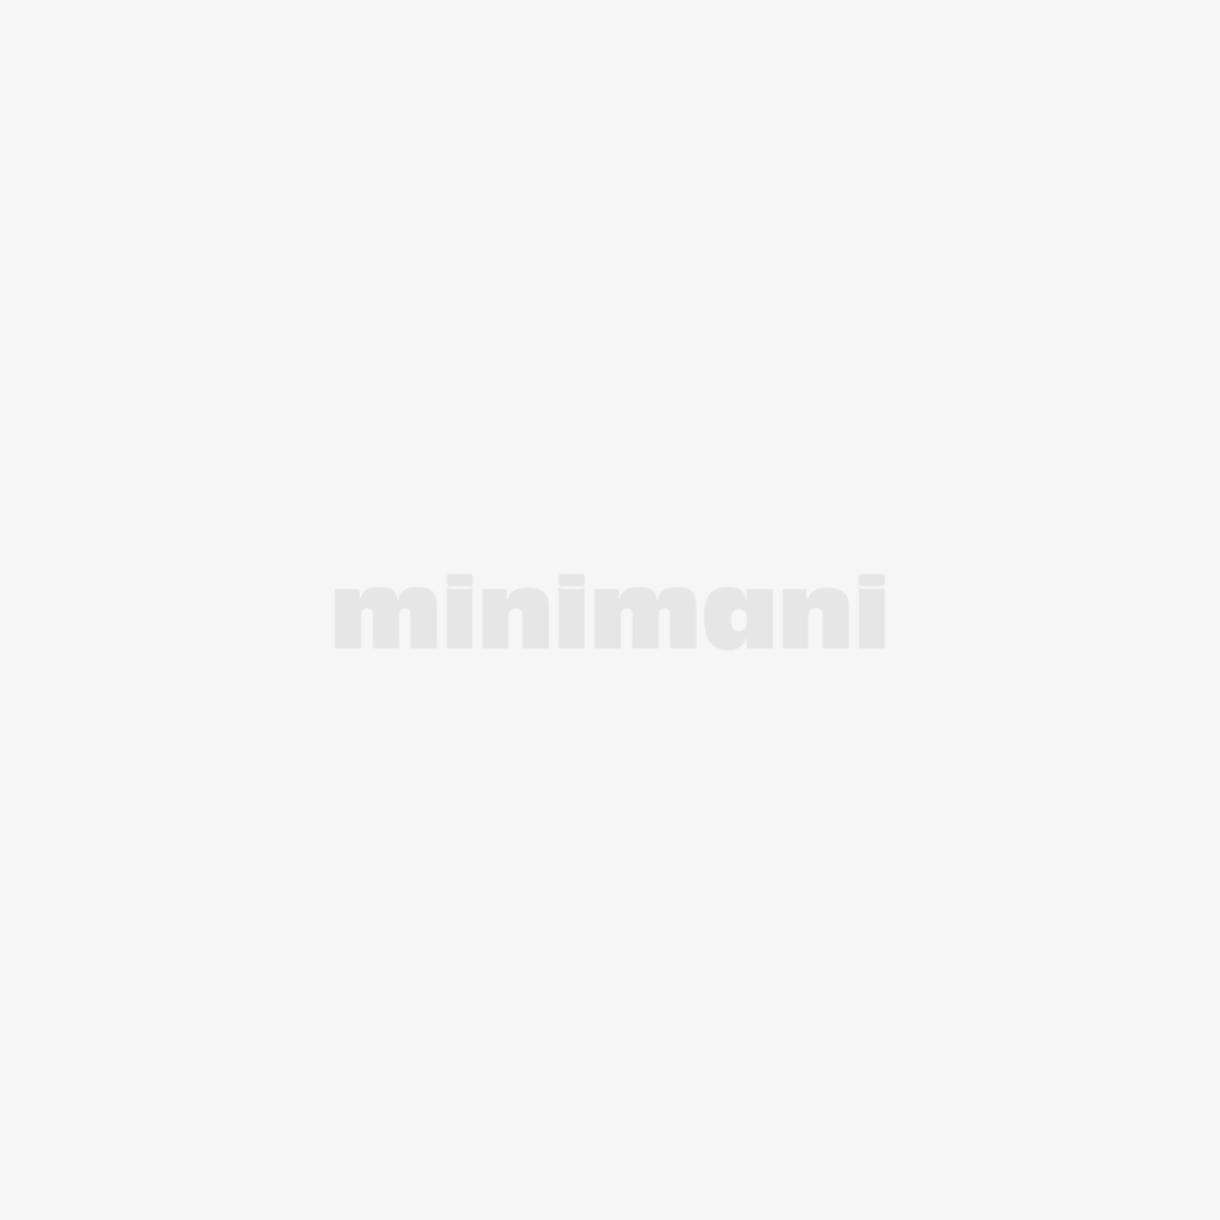 MOSQUITO NET 360 HAMMOCKILLE